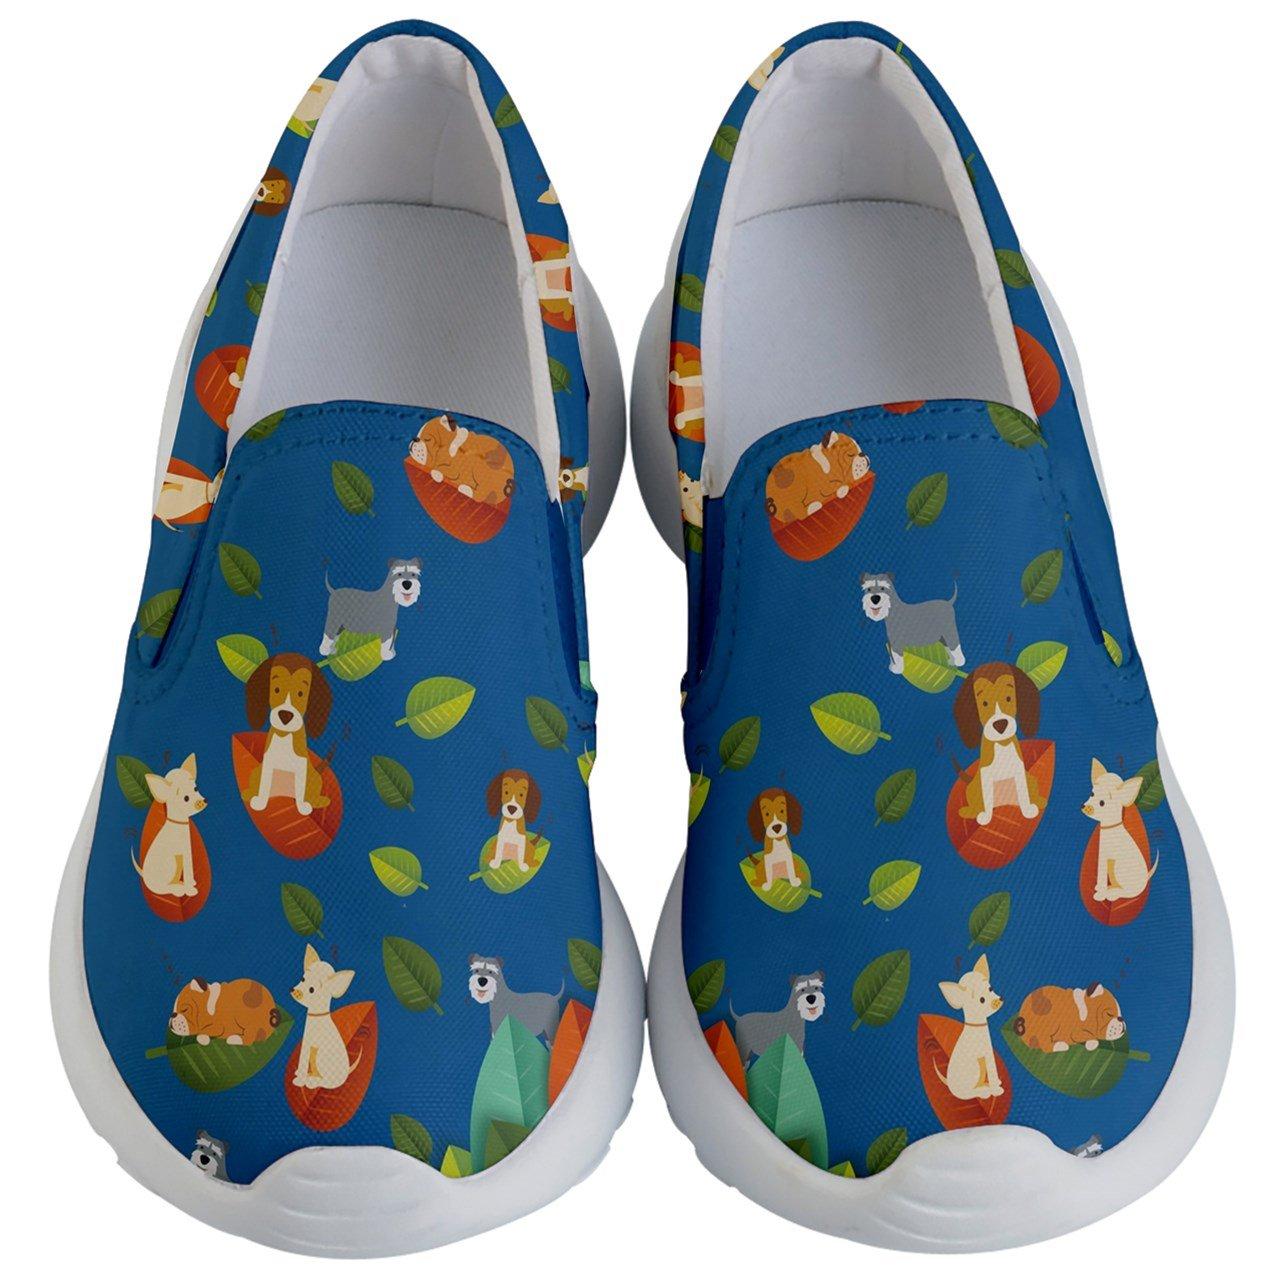 PattyCandy Unisex Toddler Shoes Castle Elephant Pug Bulldog In Wonderland Animals Print Kids Lightweight Slip Ons PattyCandy-140072883